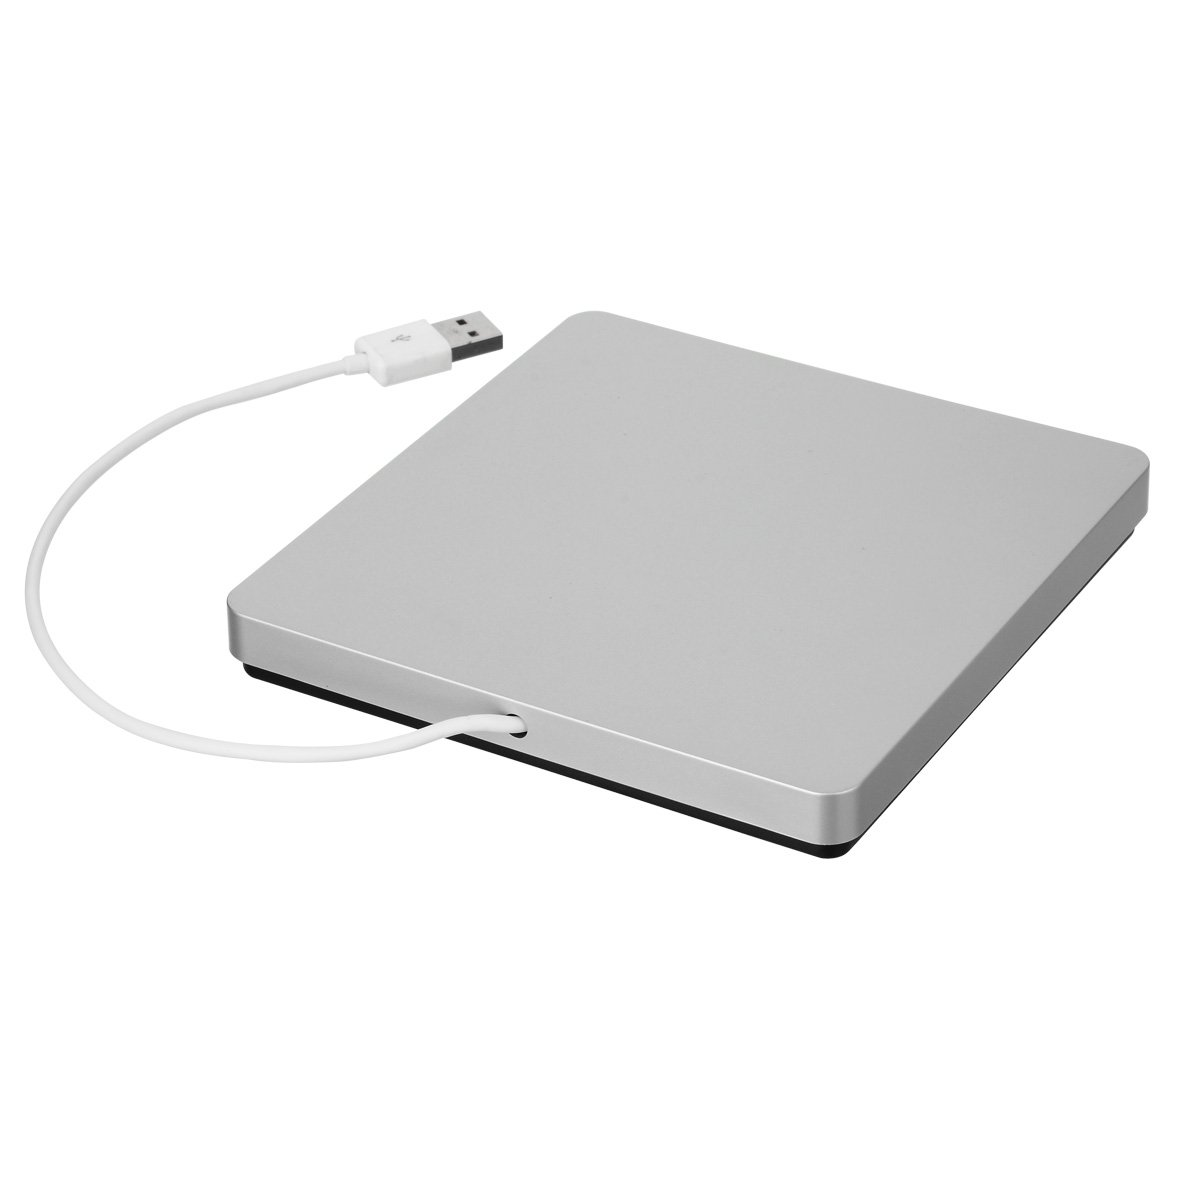 SYMTOP Estuche Carcasa USB 2.0 para grabadora Ranura Externa Ultra Slim Portátil Superdrive SATA para 371 DVD Combo / DVD-RW - Plata